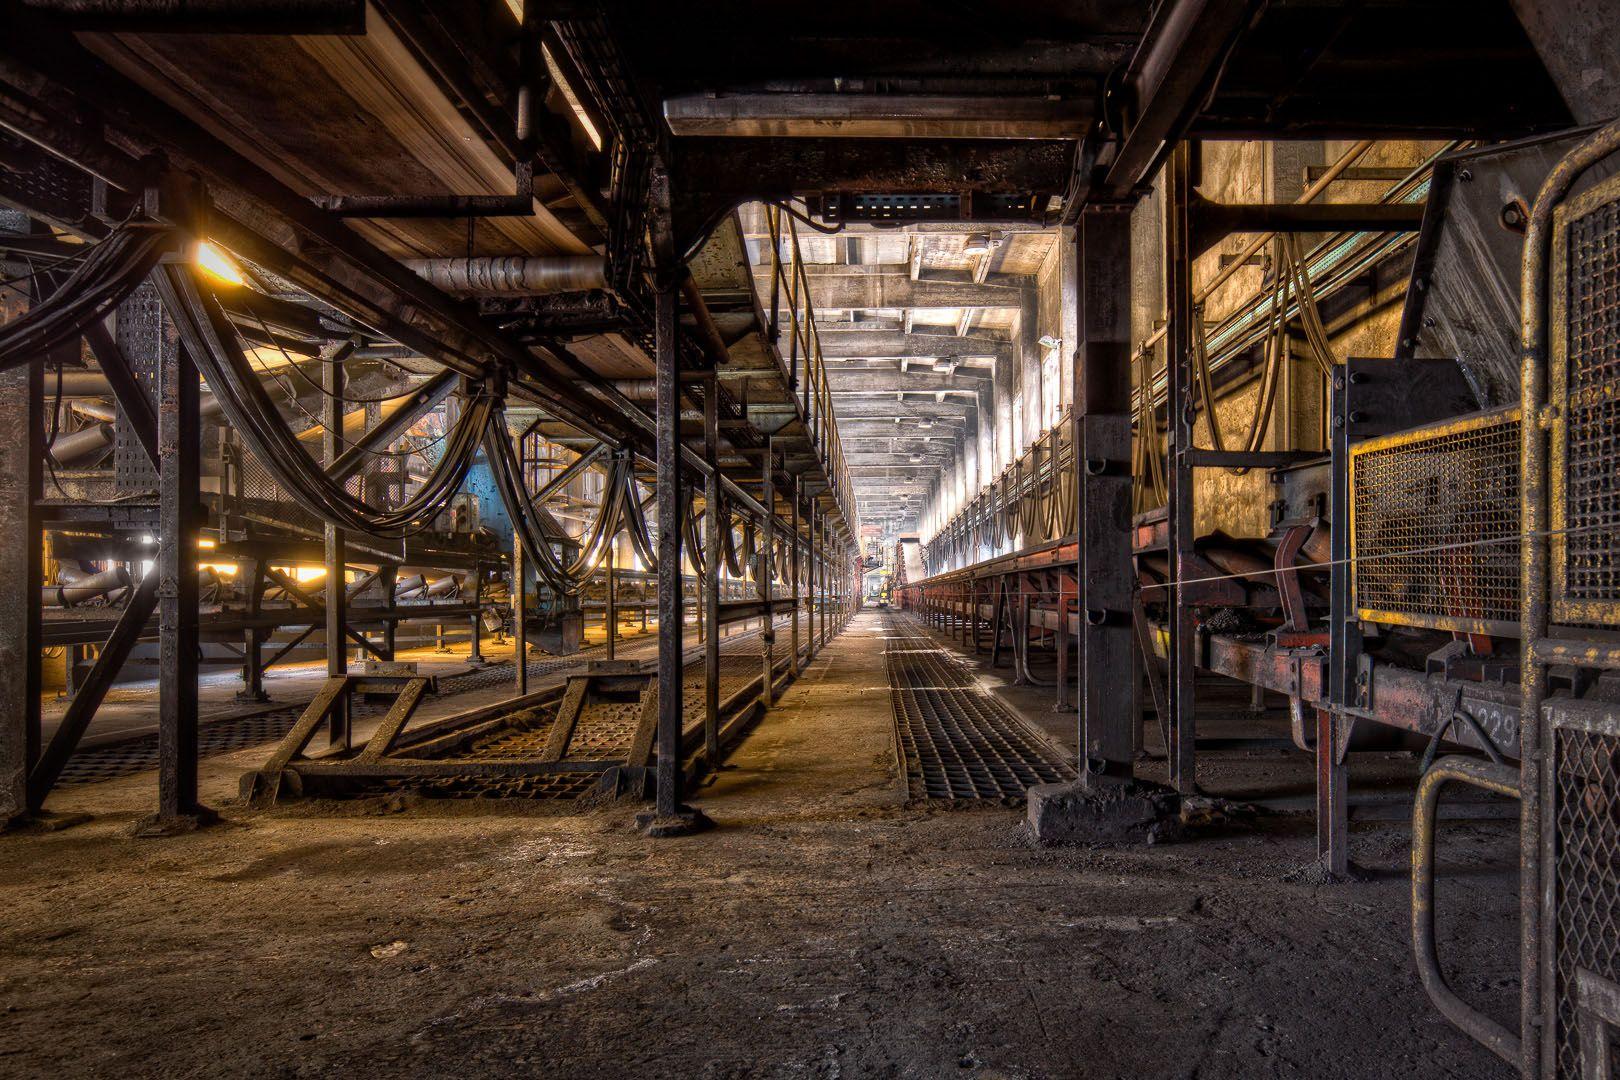 mare island shipyard photos - Google Search